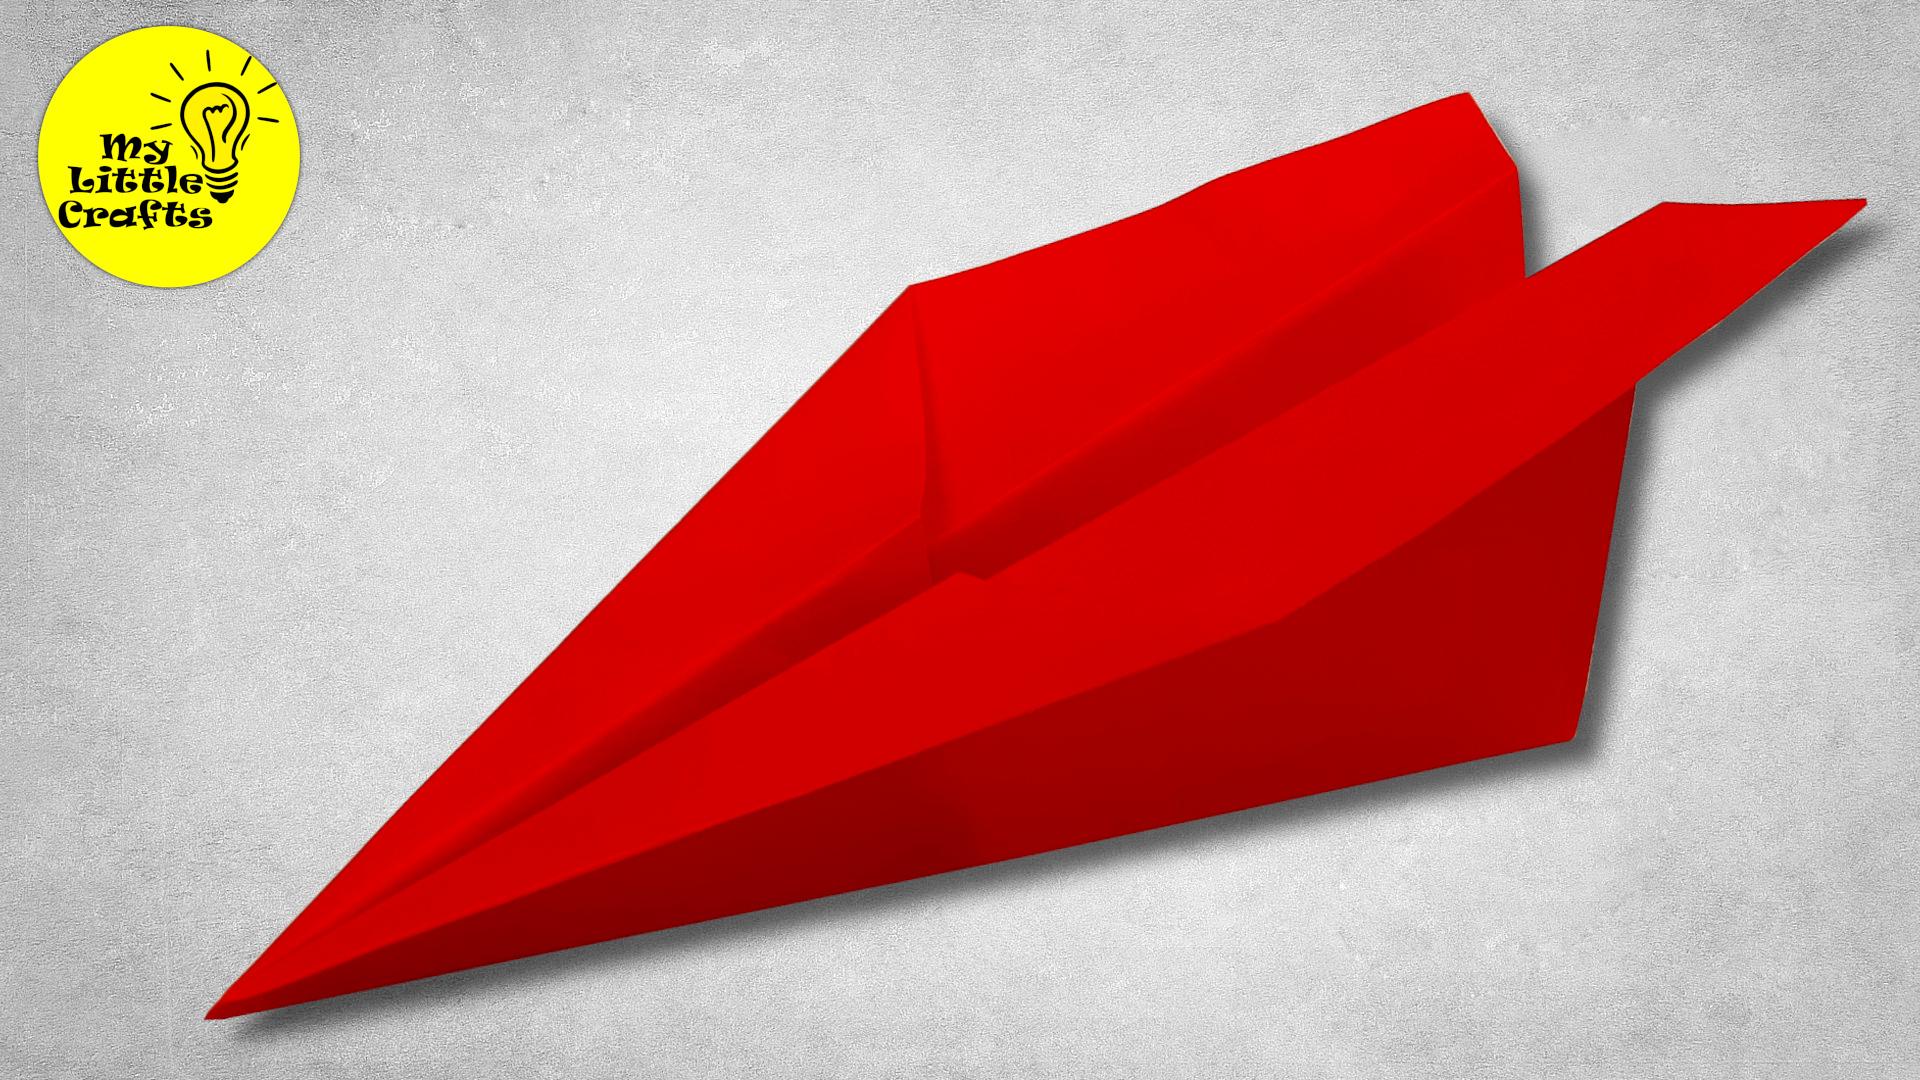 Origami Professional Paper Plane